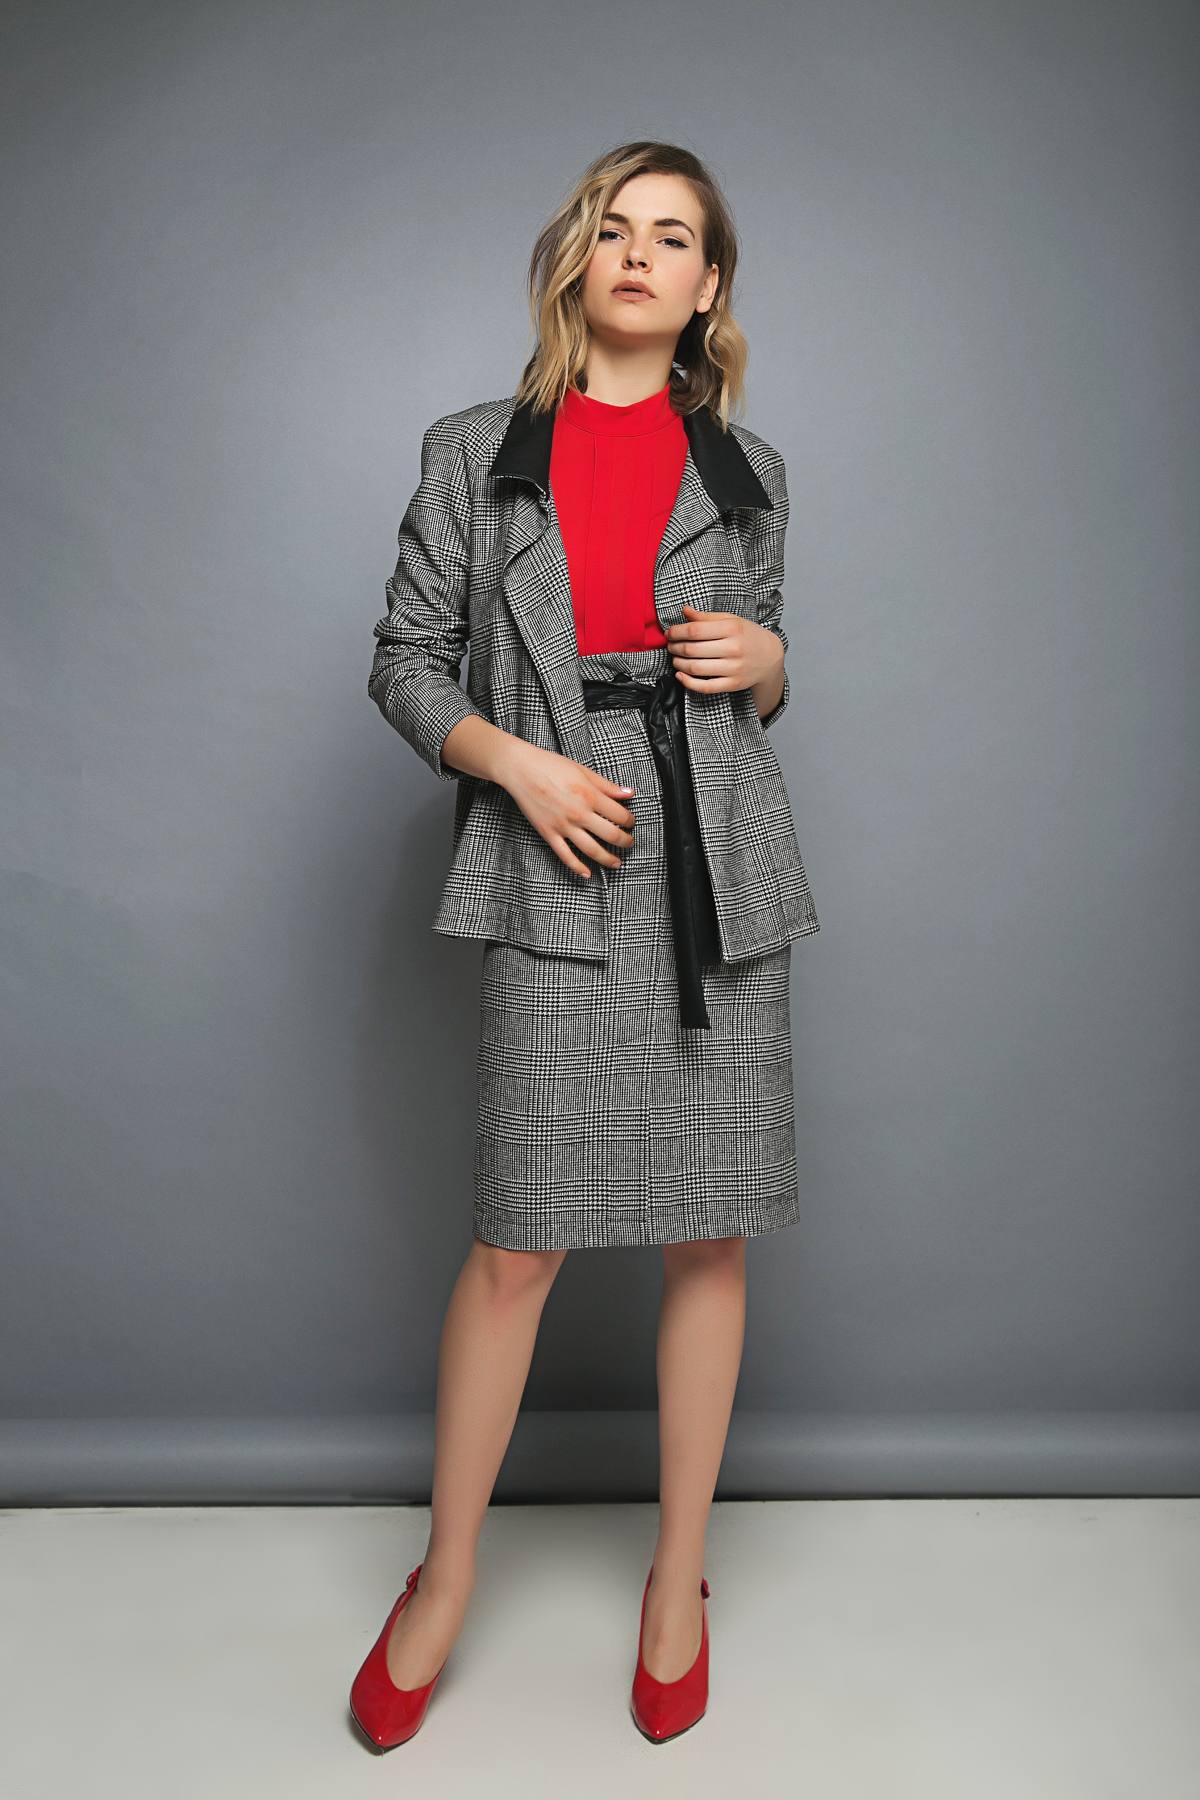 ea9912ccee07 Γυναικεία Ρούχα - DARLING Mina Siampi Καλαμάτα